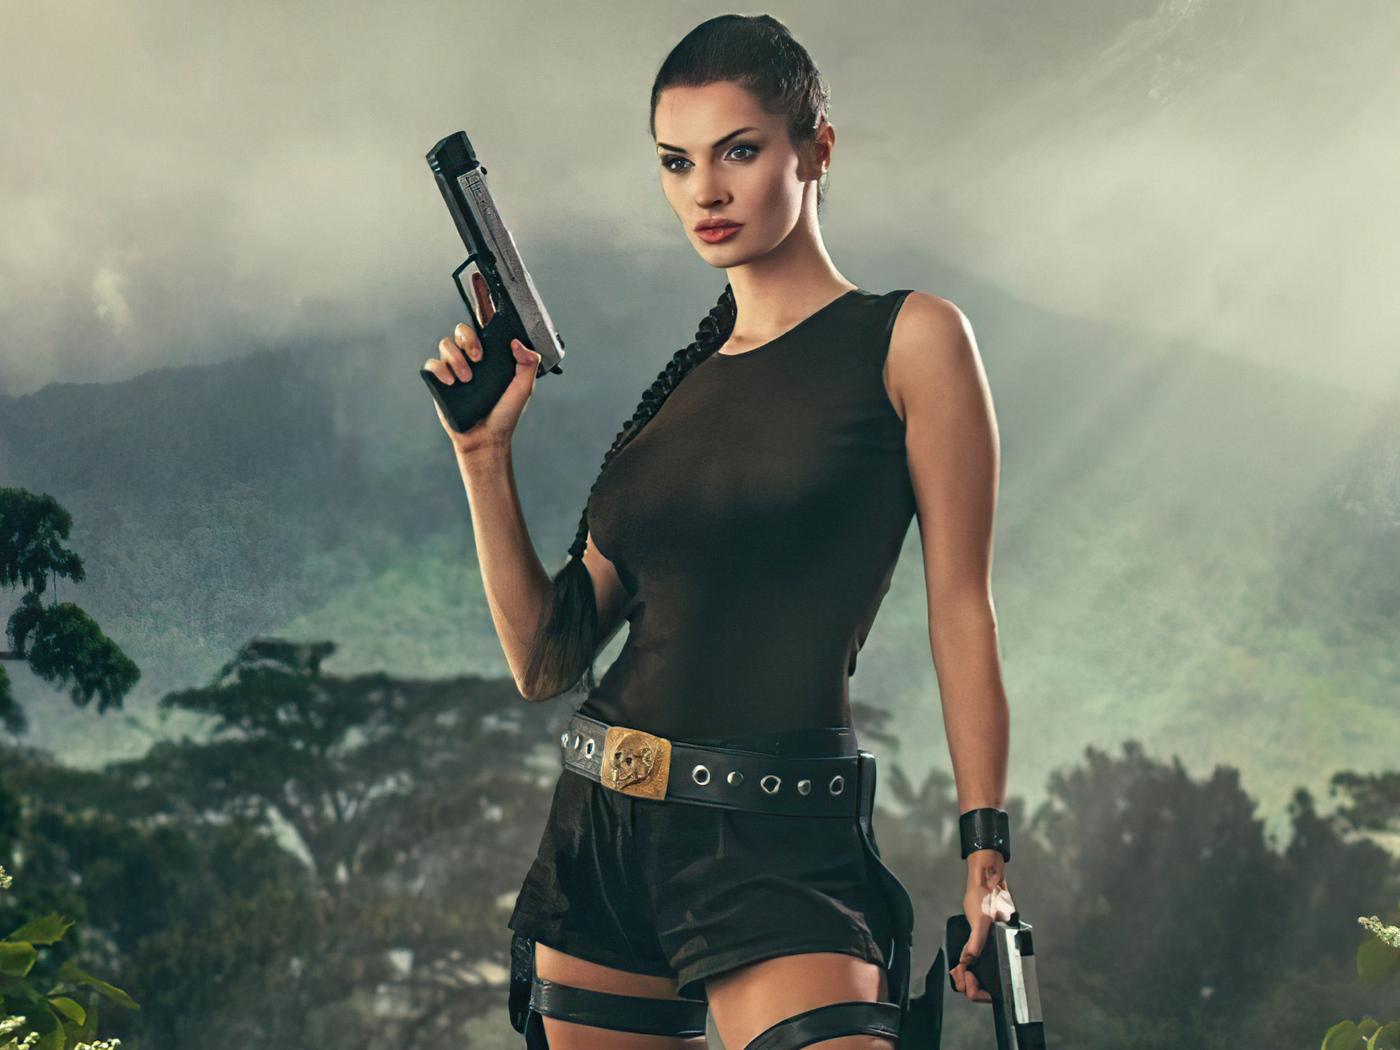 tombraider-cosplay-girl-4k-v6.jpg